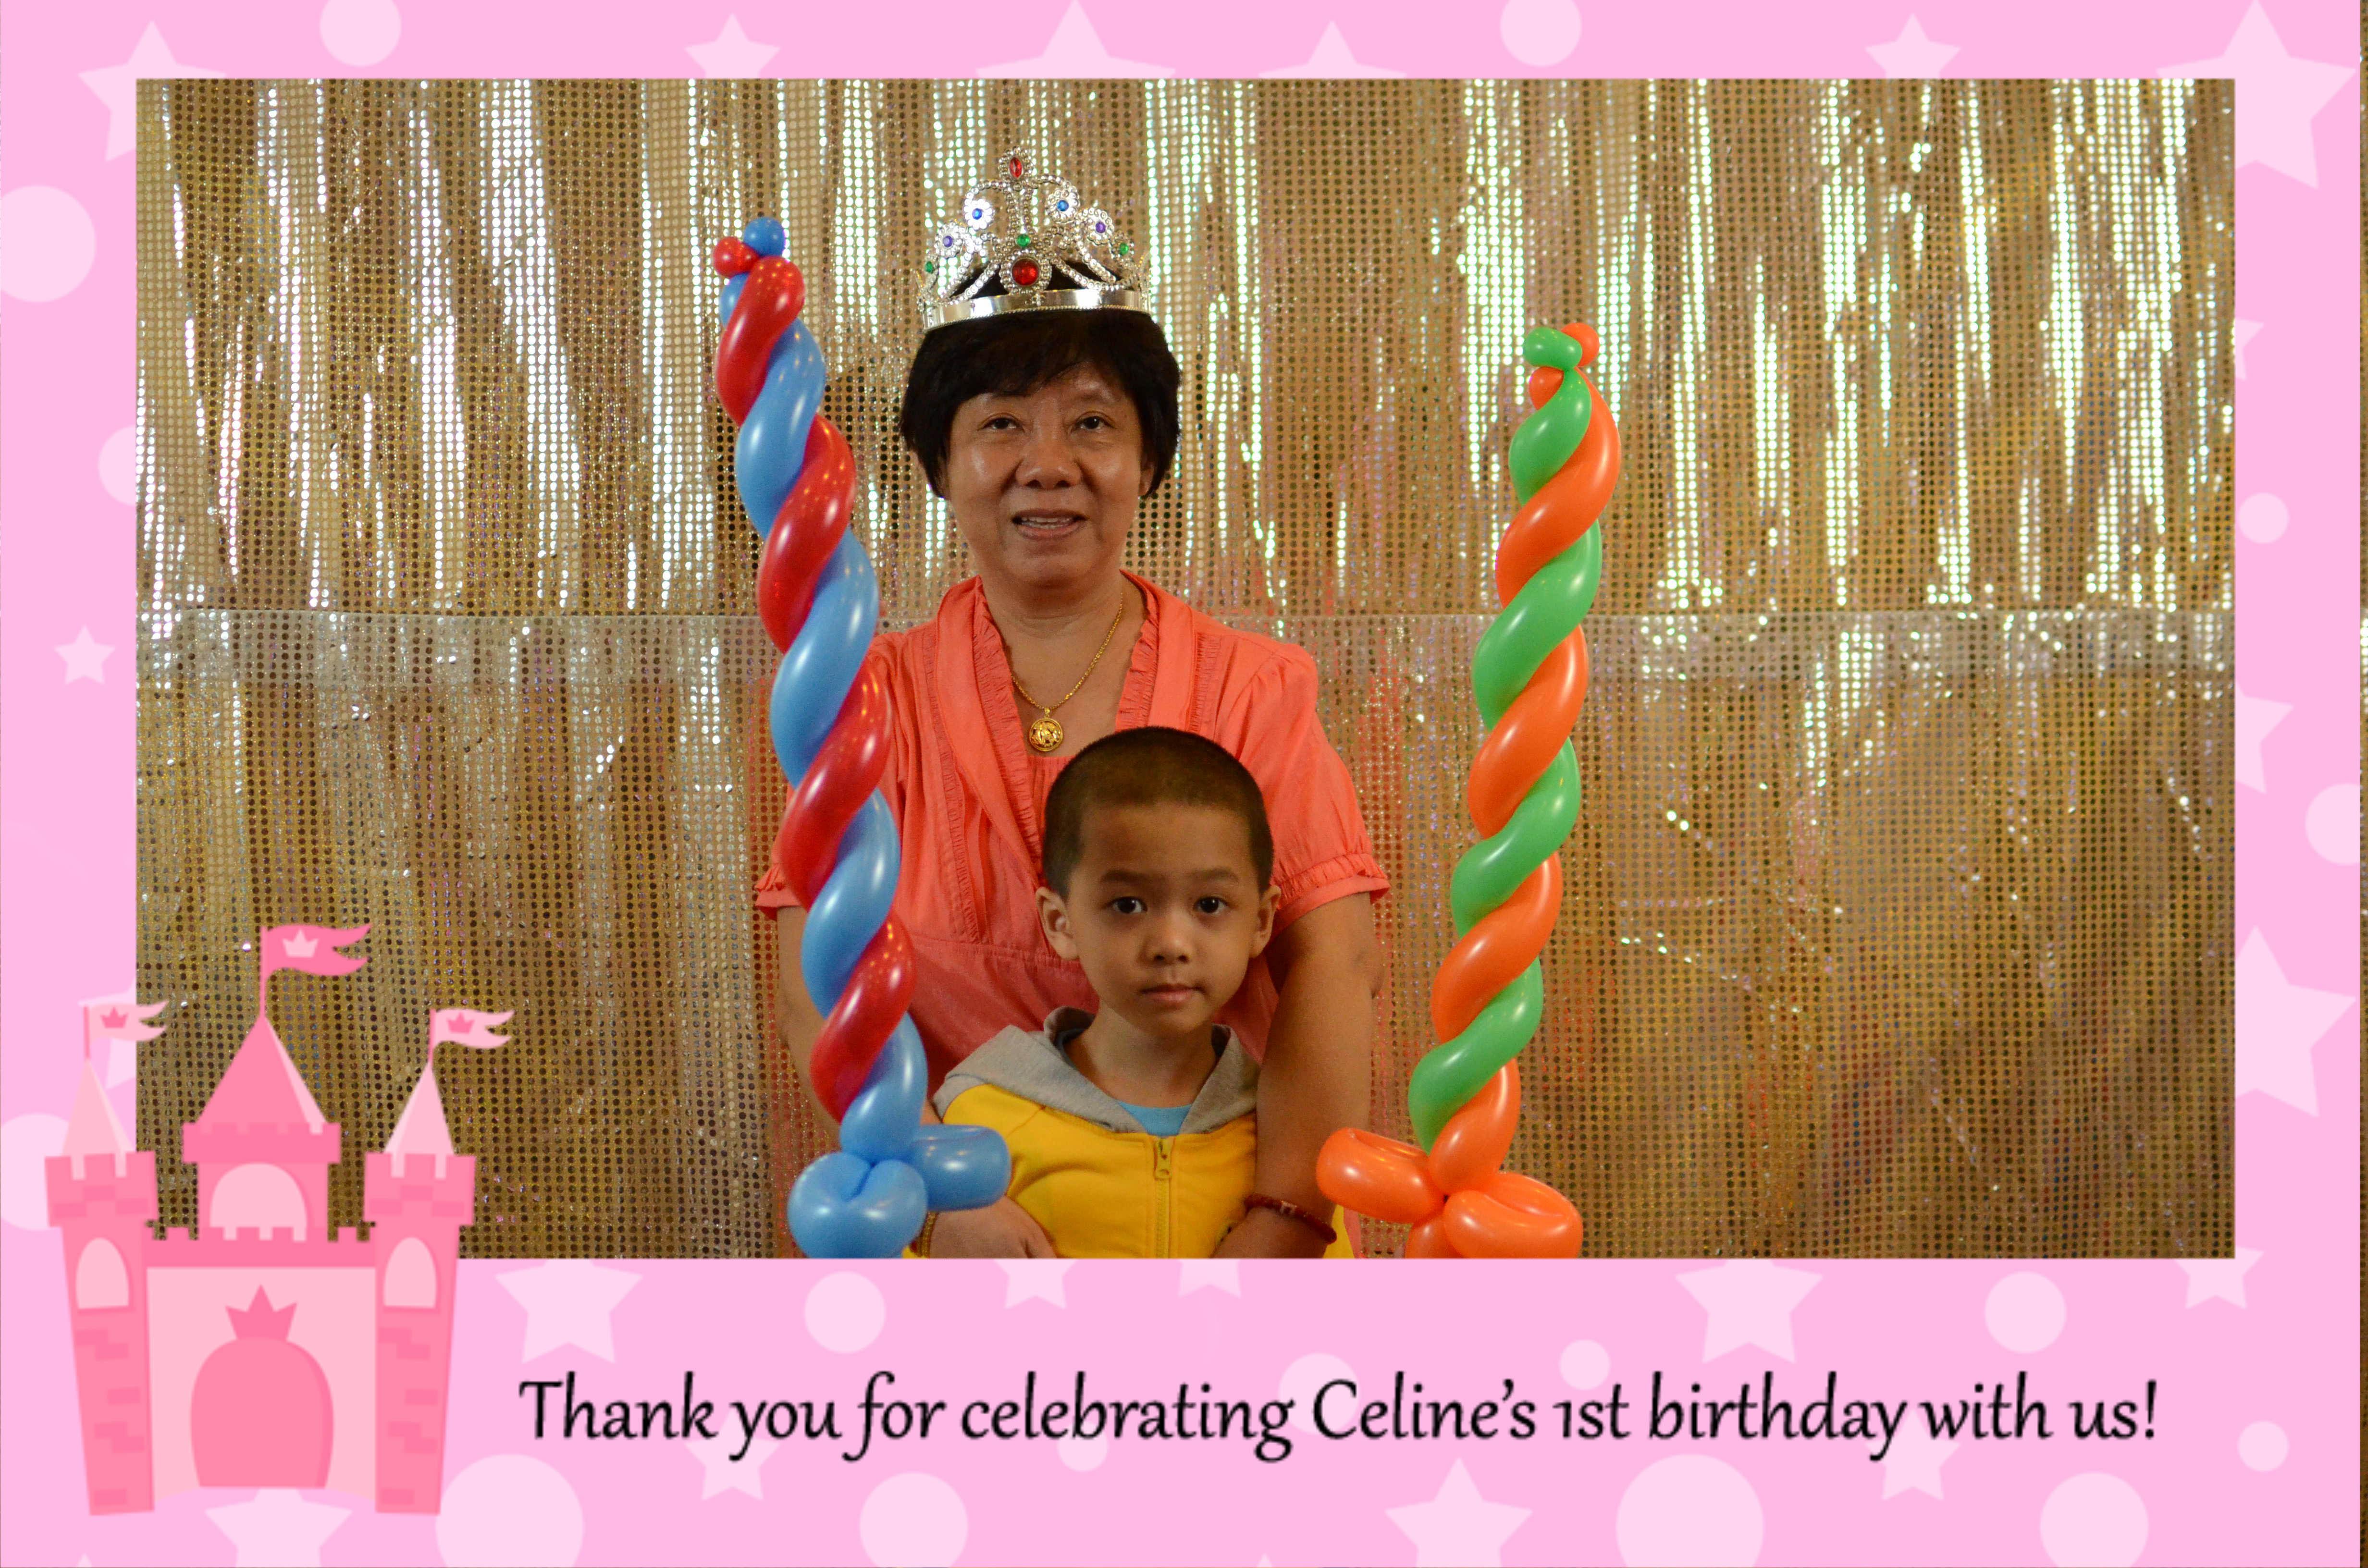 Celine-71.jpg